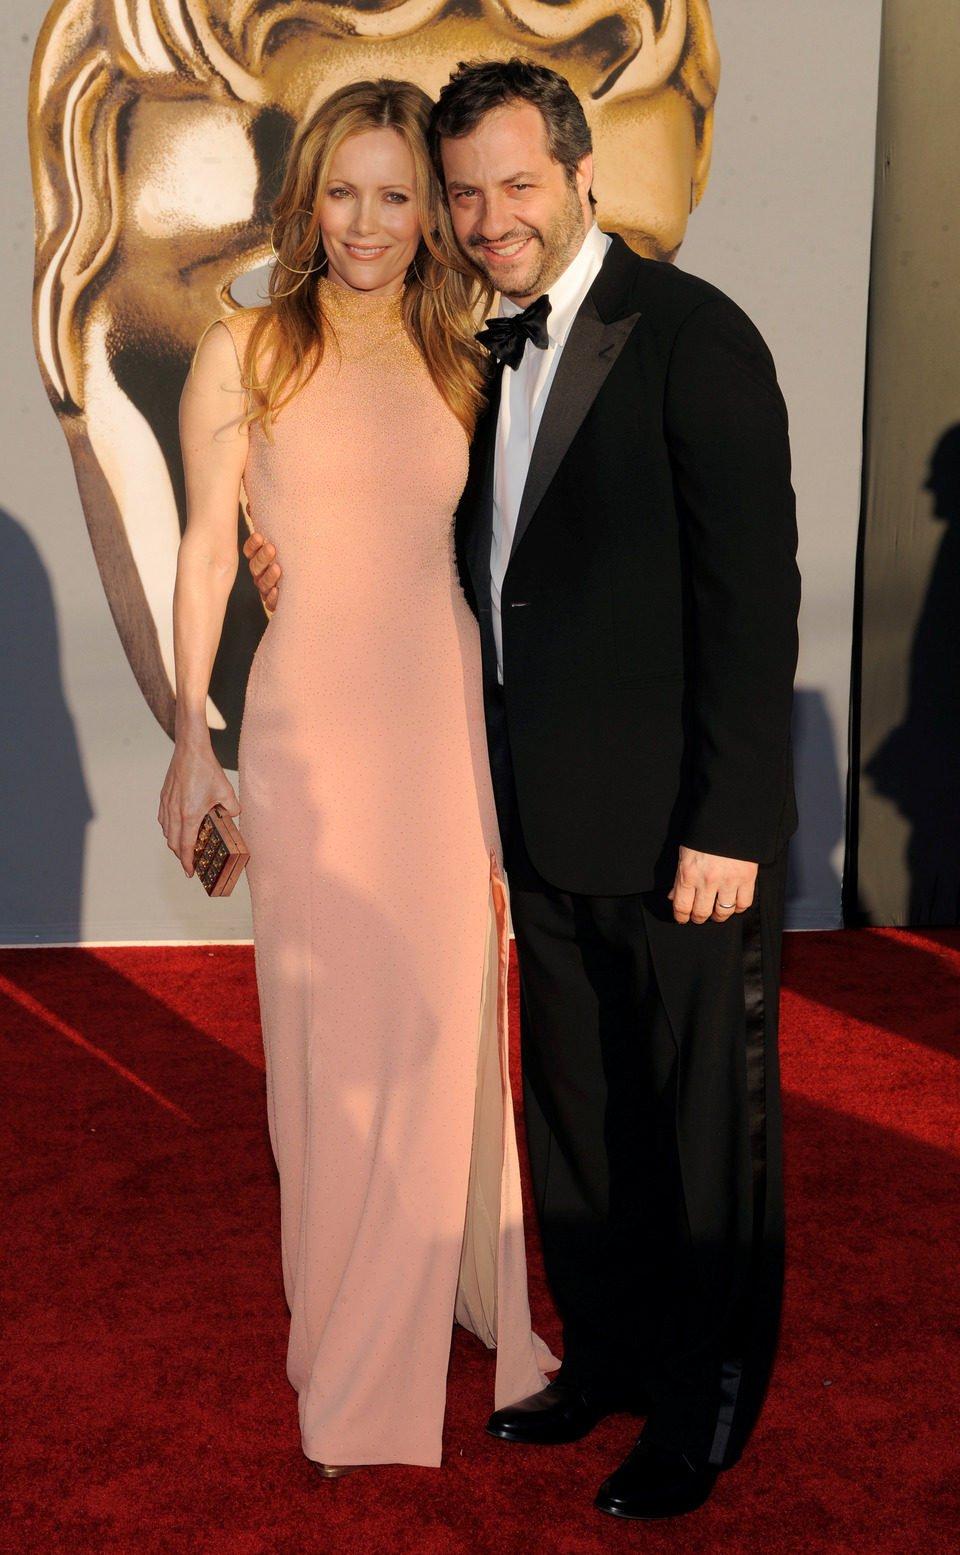 Judd Apatow y Leslie Mann asisten a los BAFTA Brits